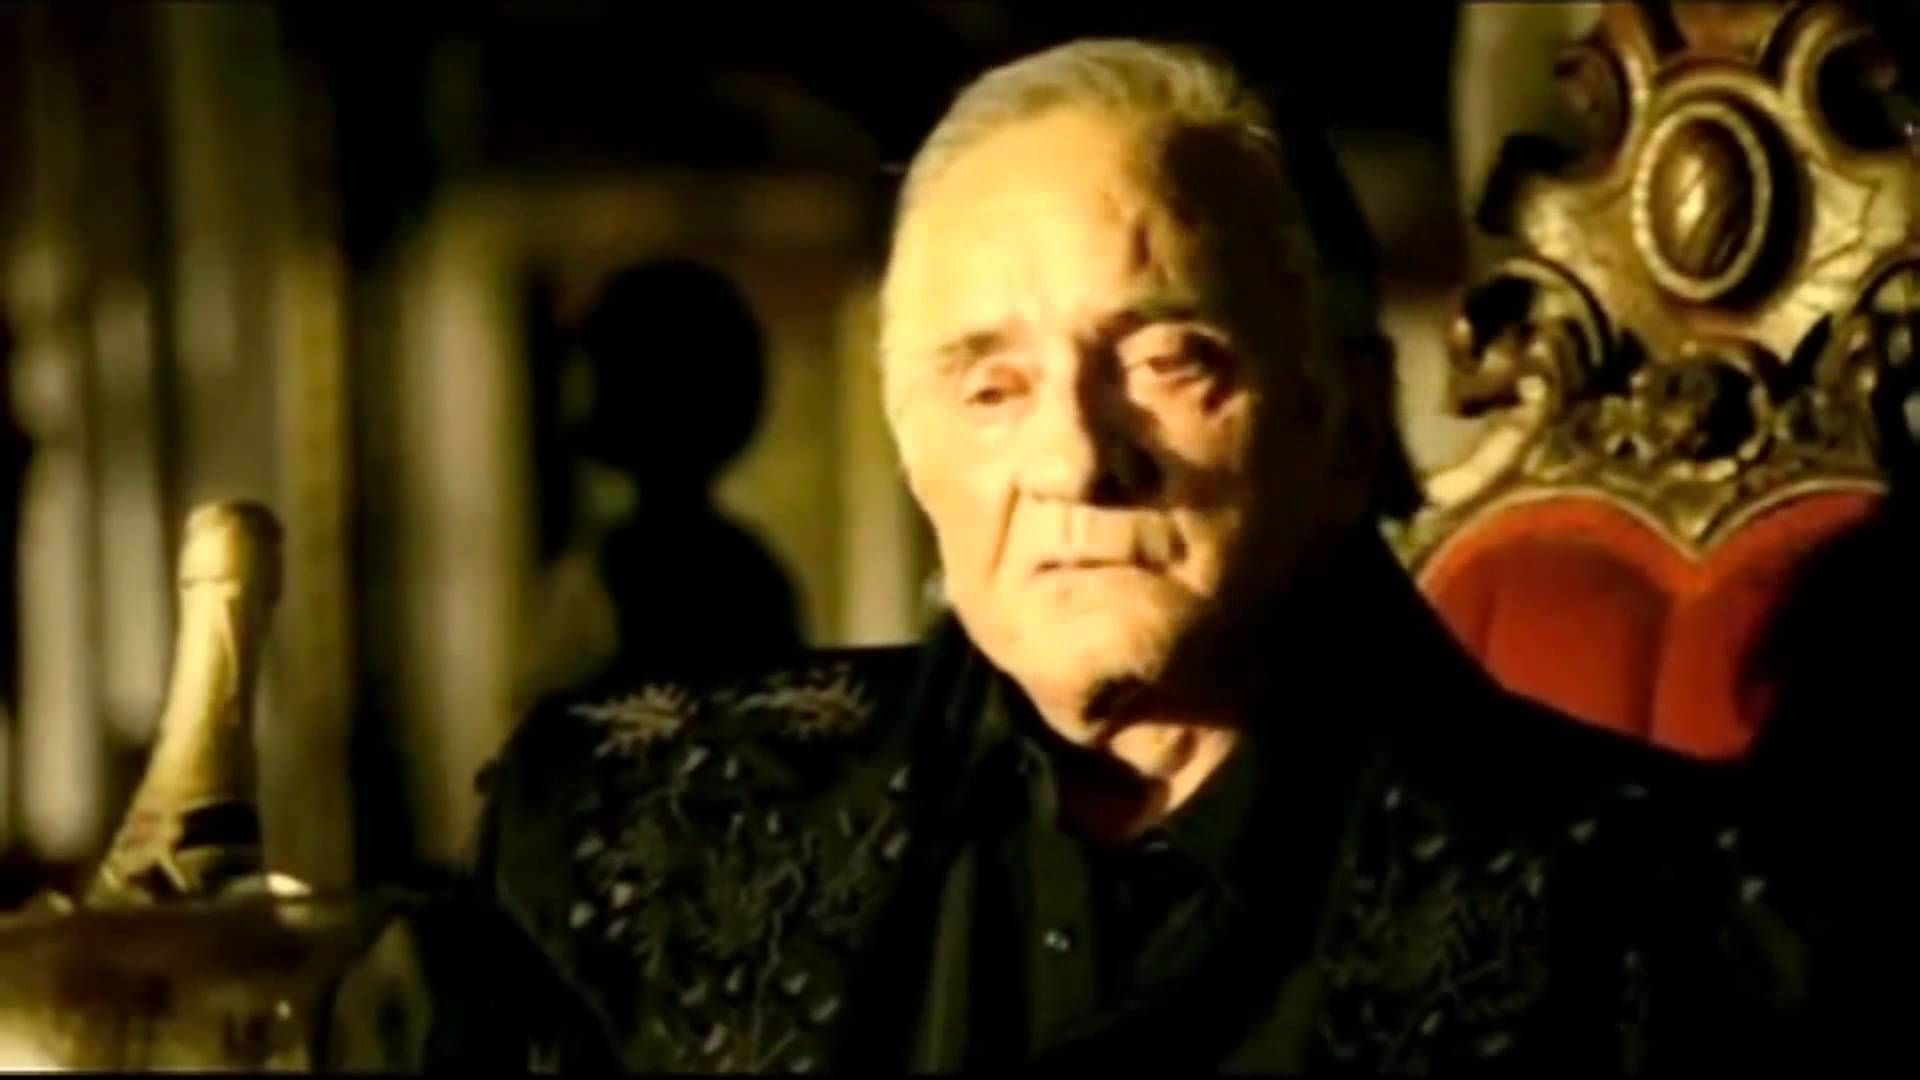 Johnny Cash - Hurt (Music Video) HD/HQ - NineInchNails Cover ...